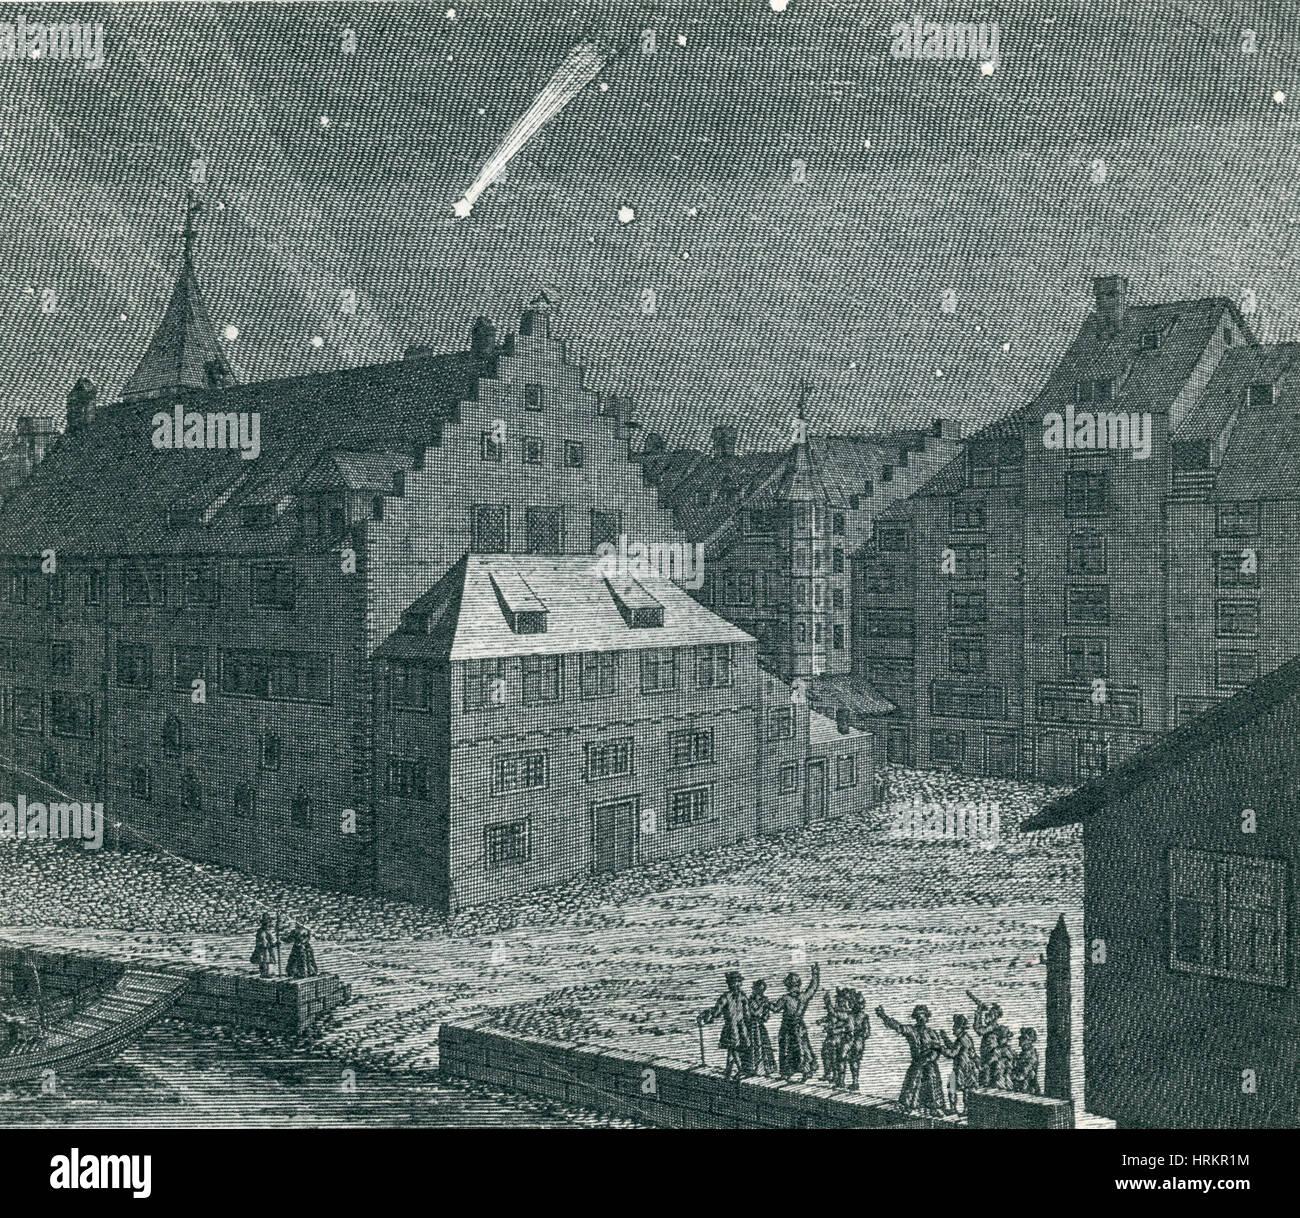 Comet, Einsiedeln Monastery, 1742 - Stock Image